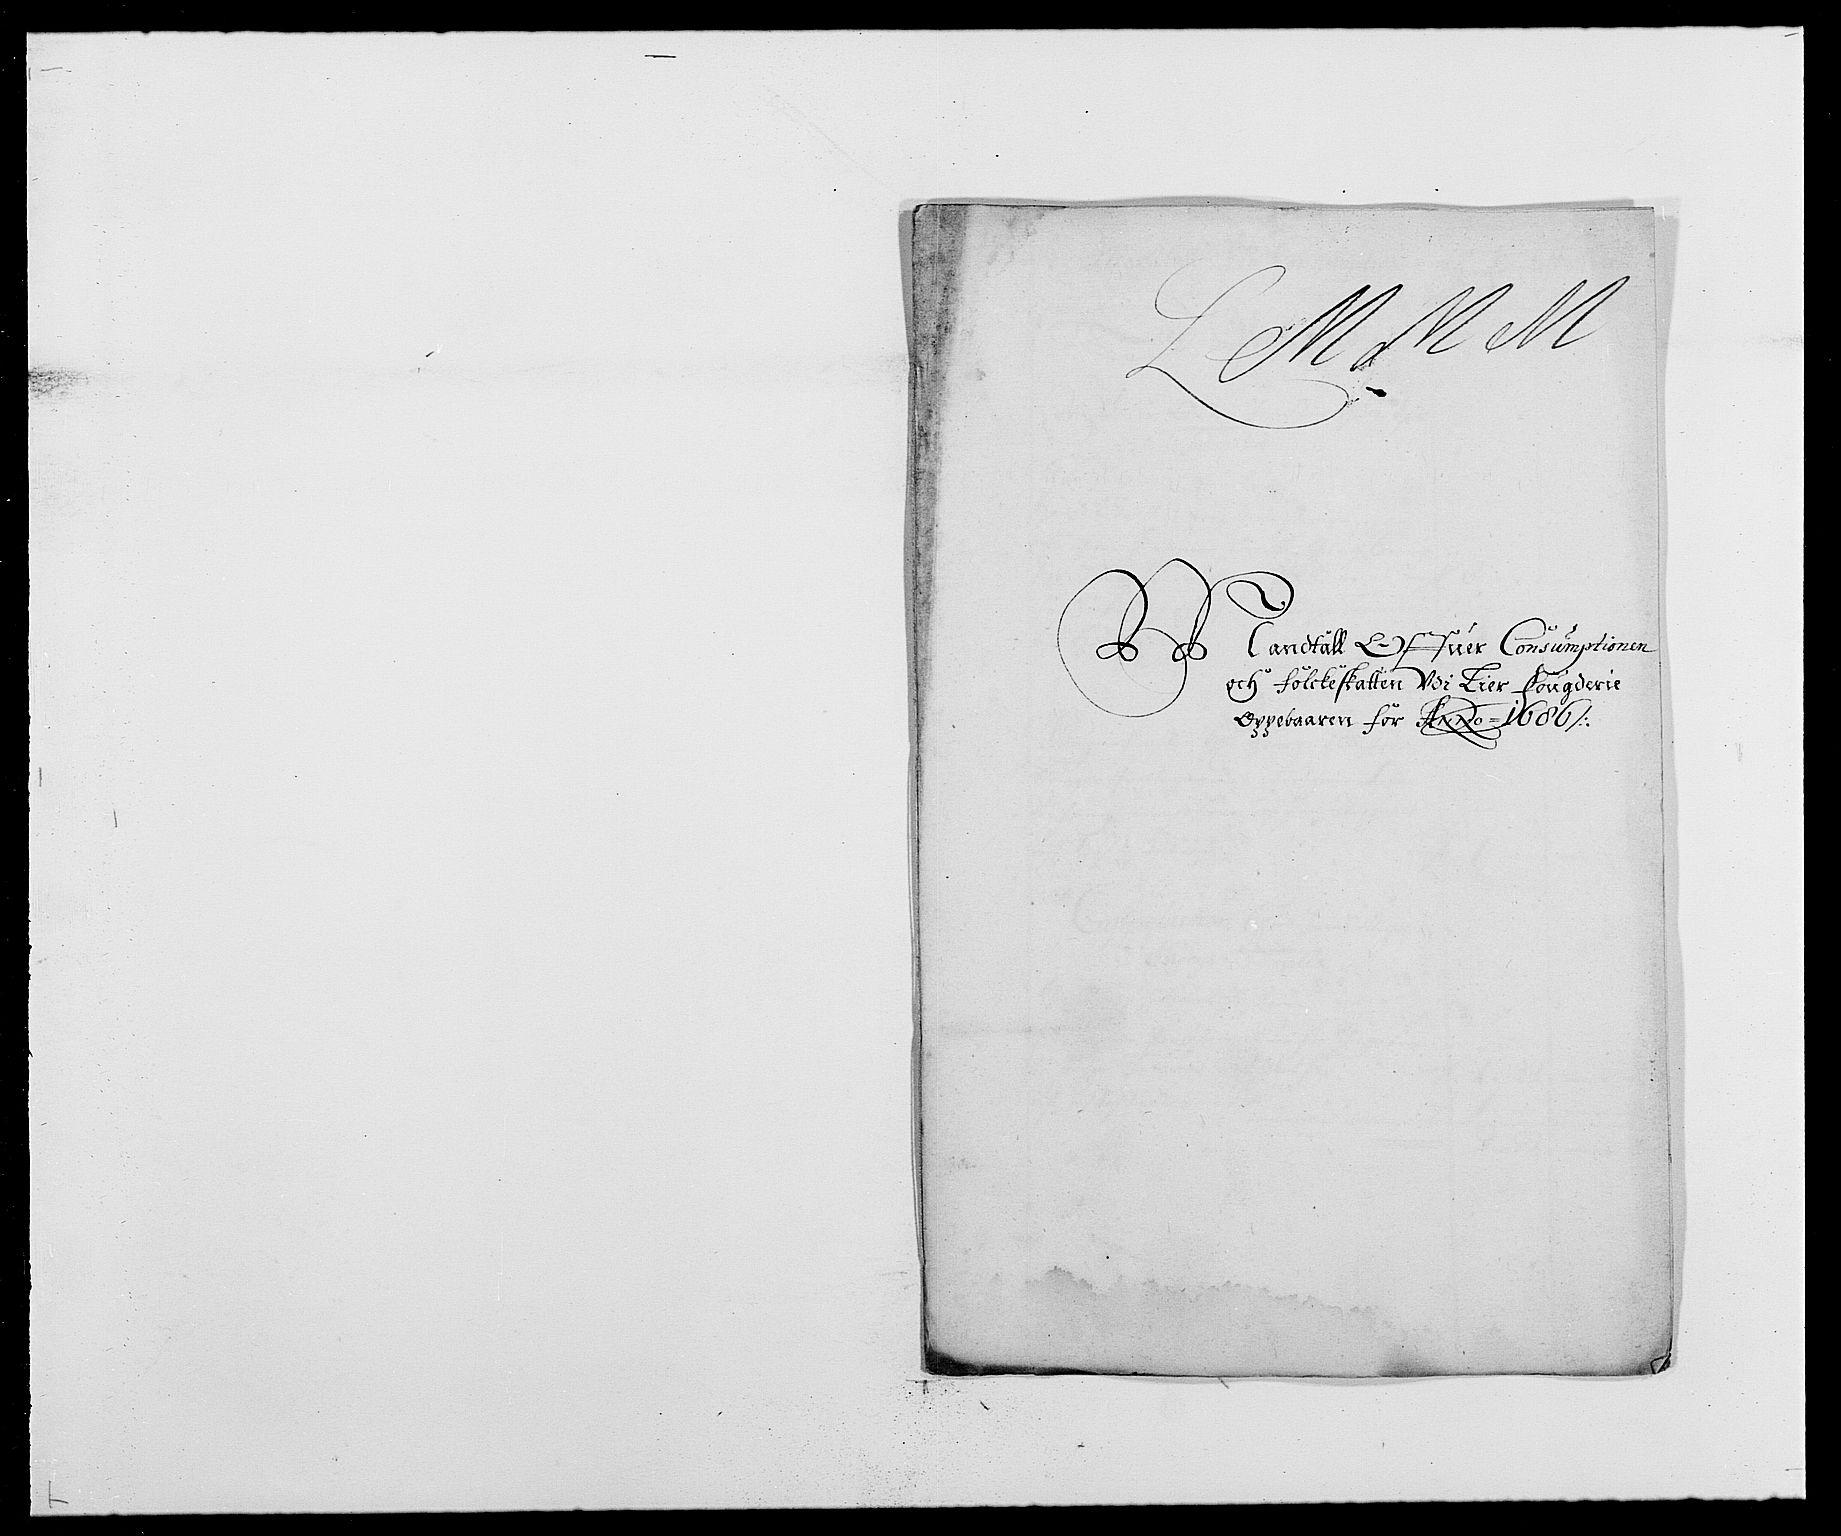 RA, Rentekammeret inntil 1814, Reviderte regnskaper, Fogderegnskap, R27/L1687: Fogderegnskap Lier, 1678-1686, s. 273